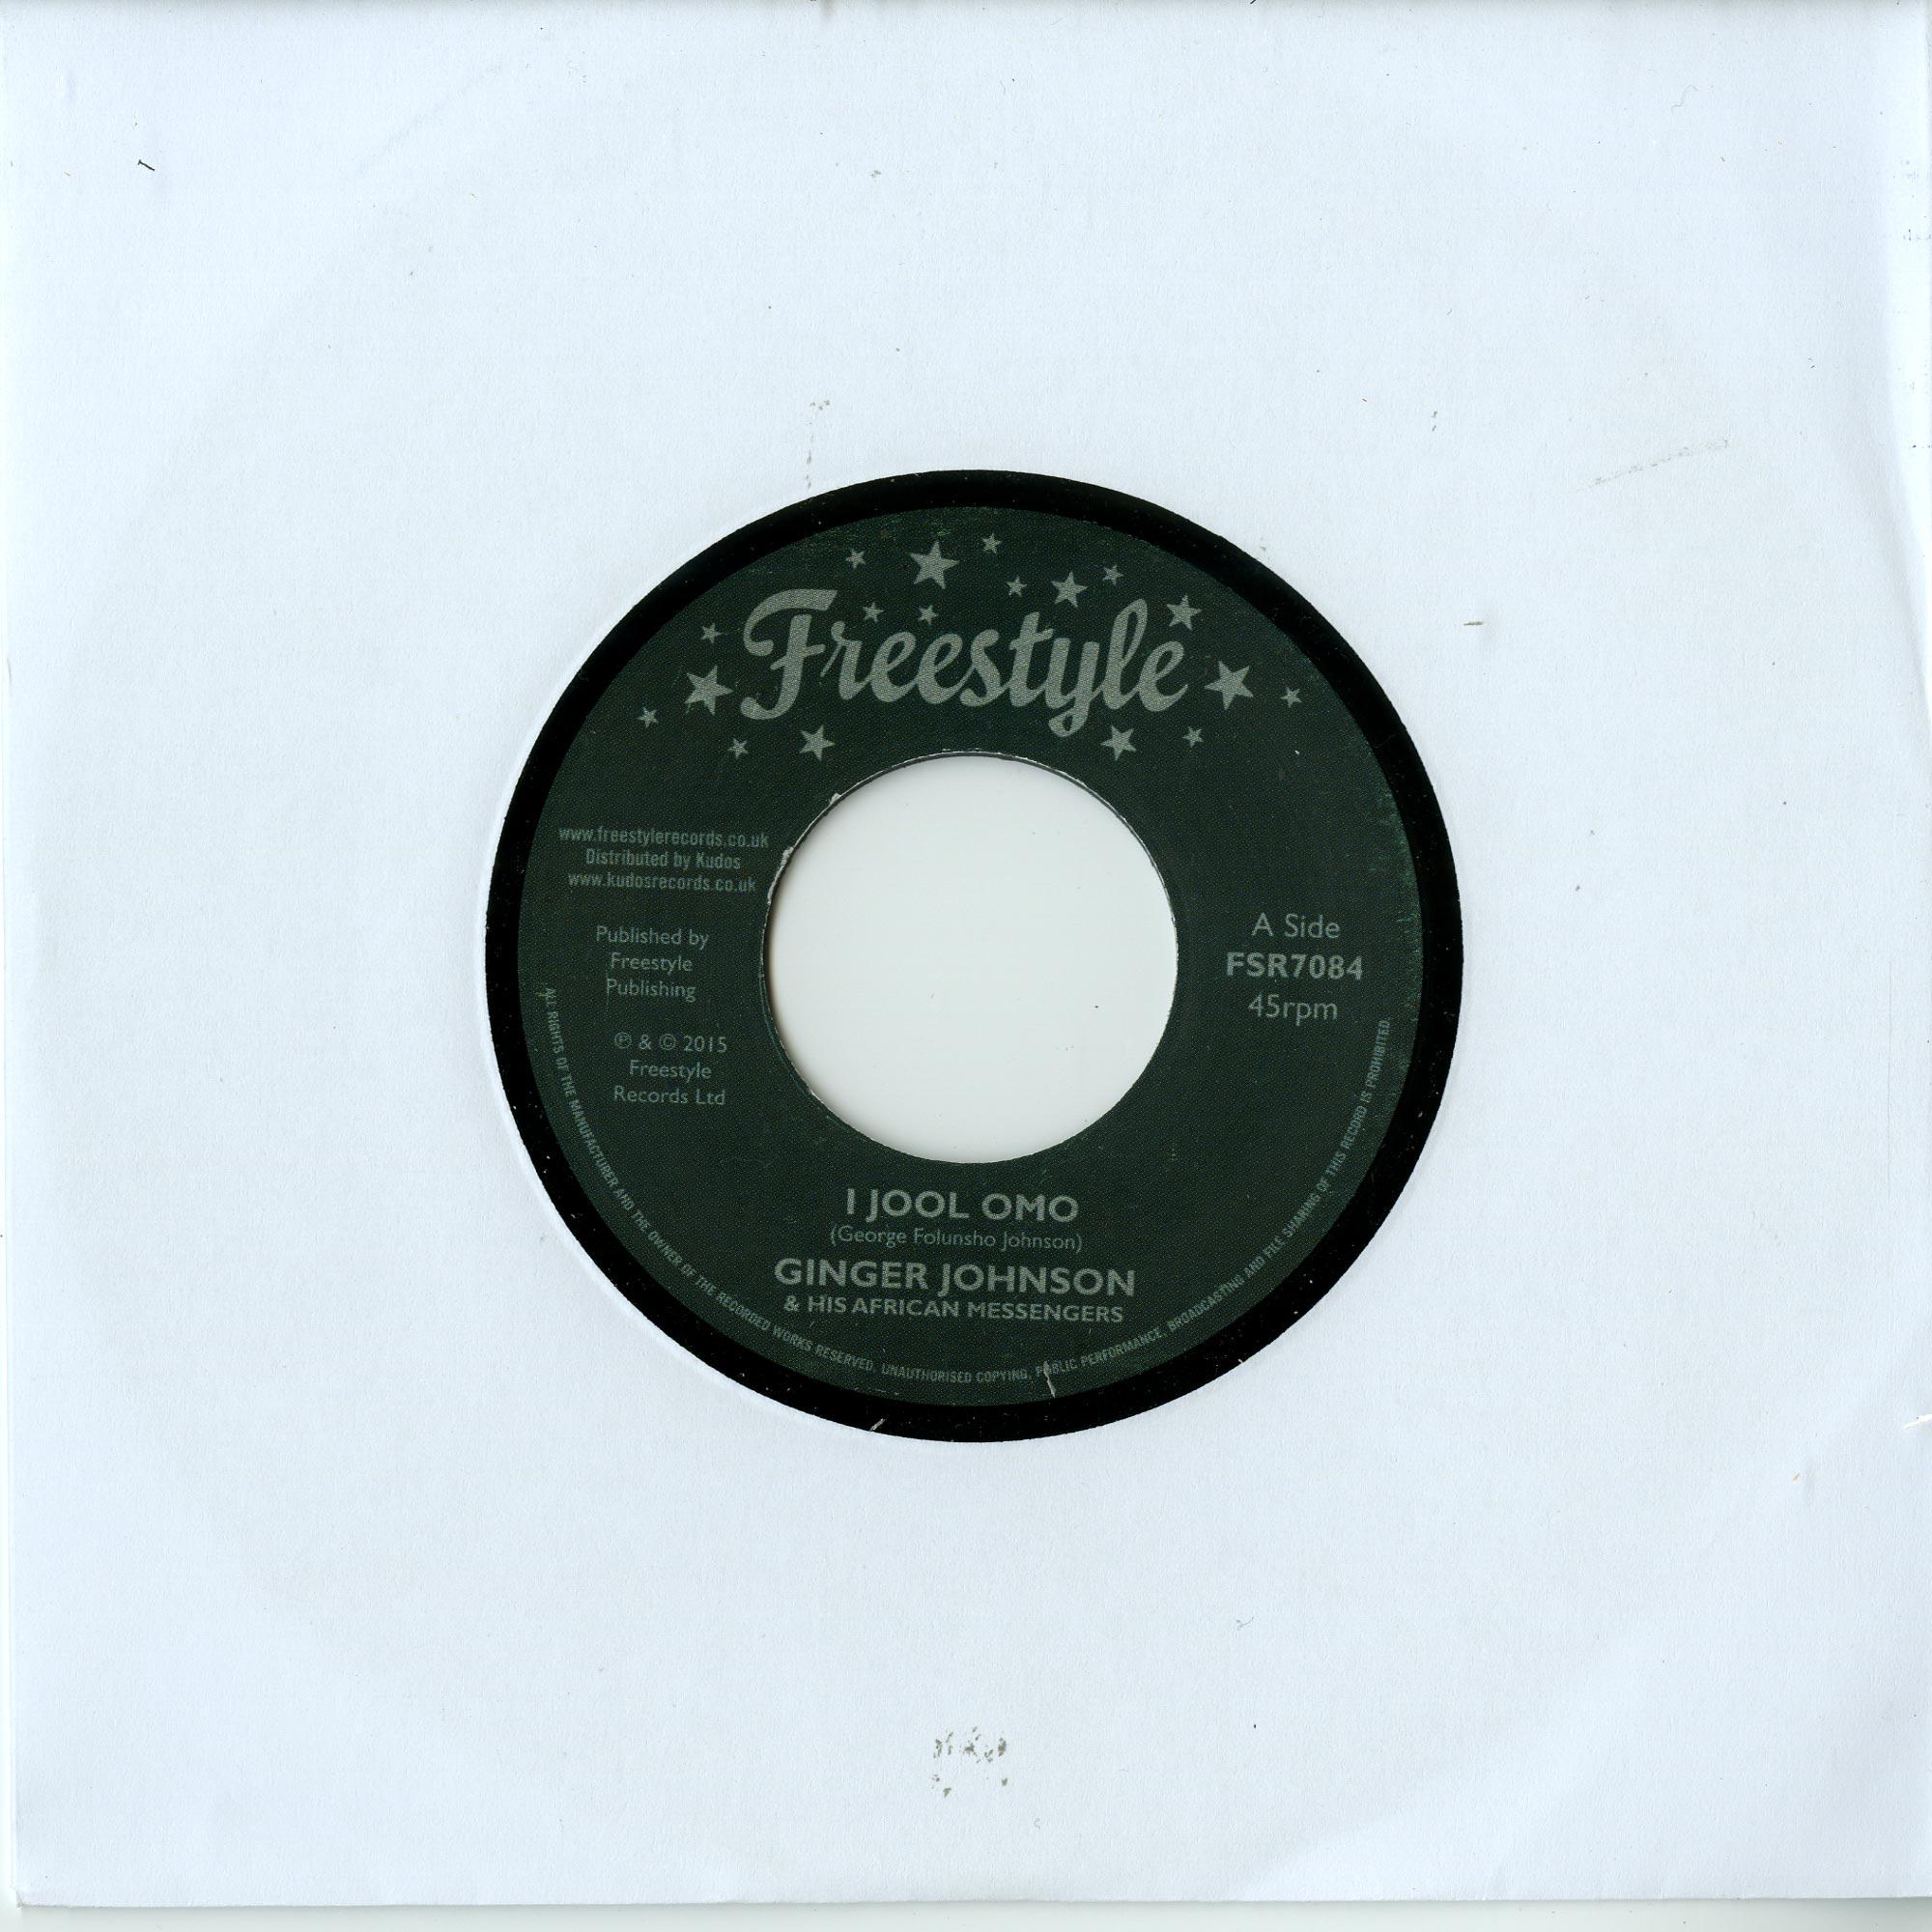 Ginger Johnson - I JOOL OMO